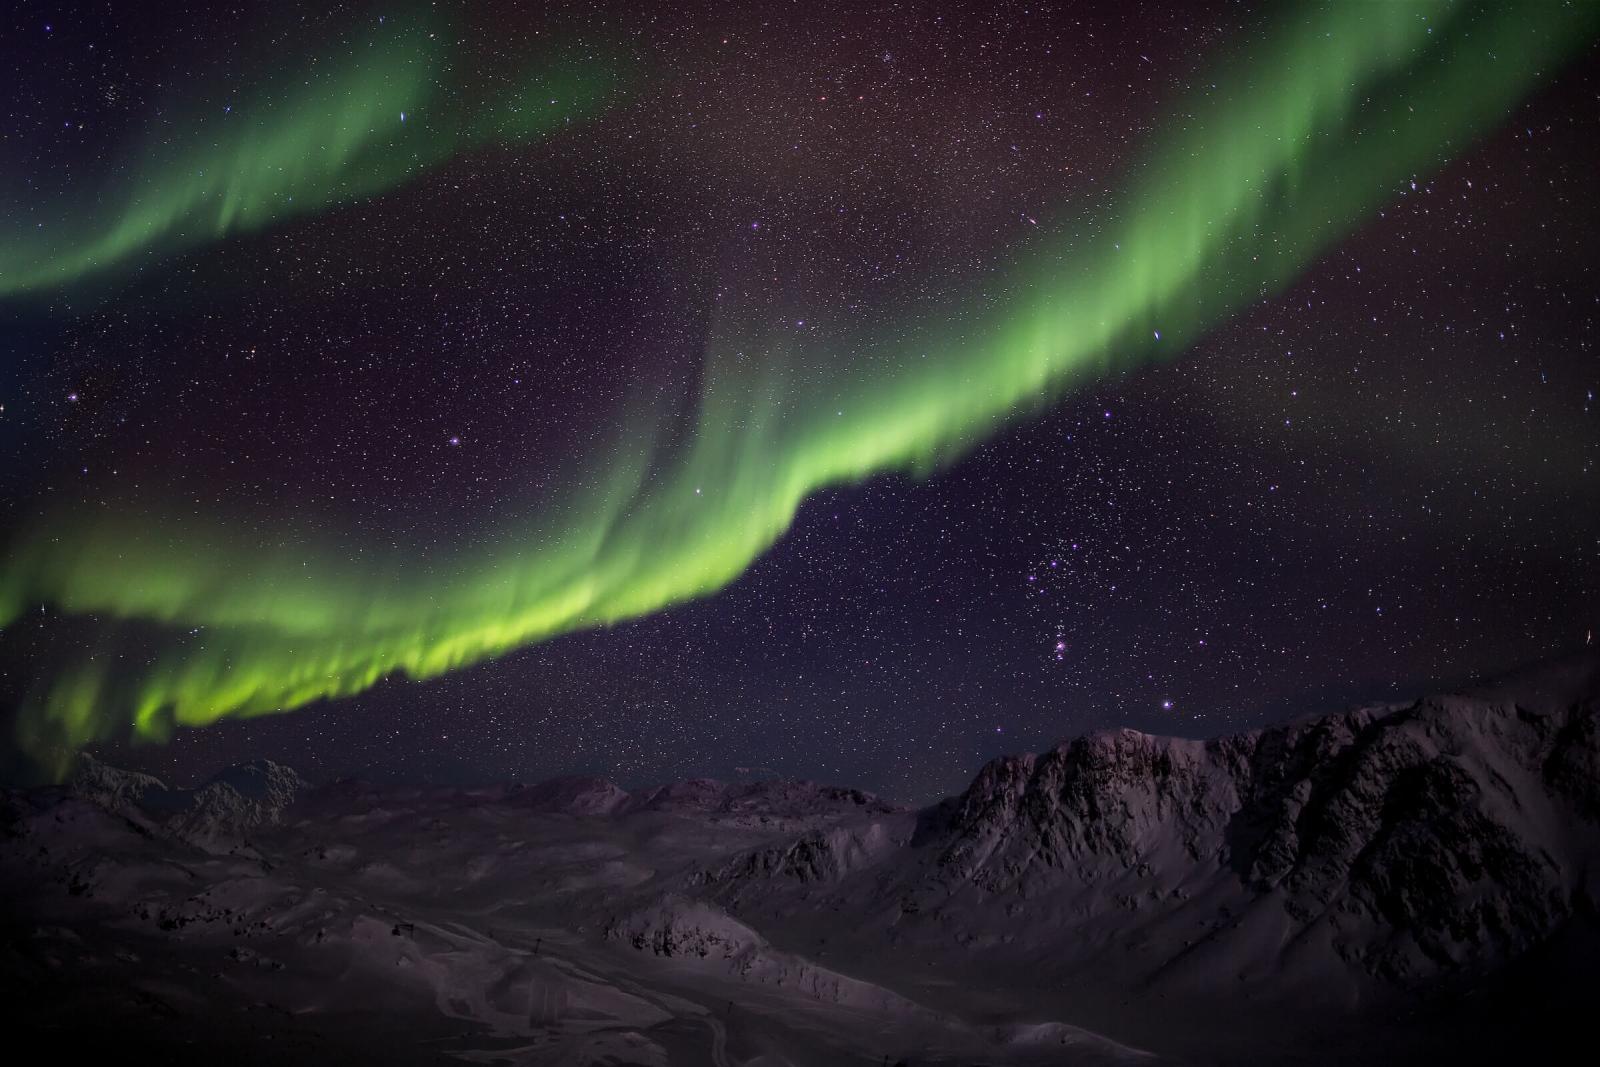 Northern Lights. By Mads Pihl